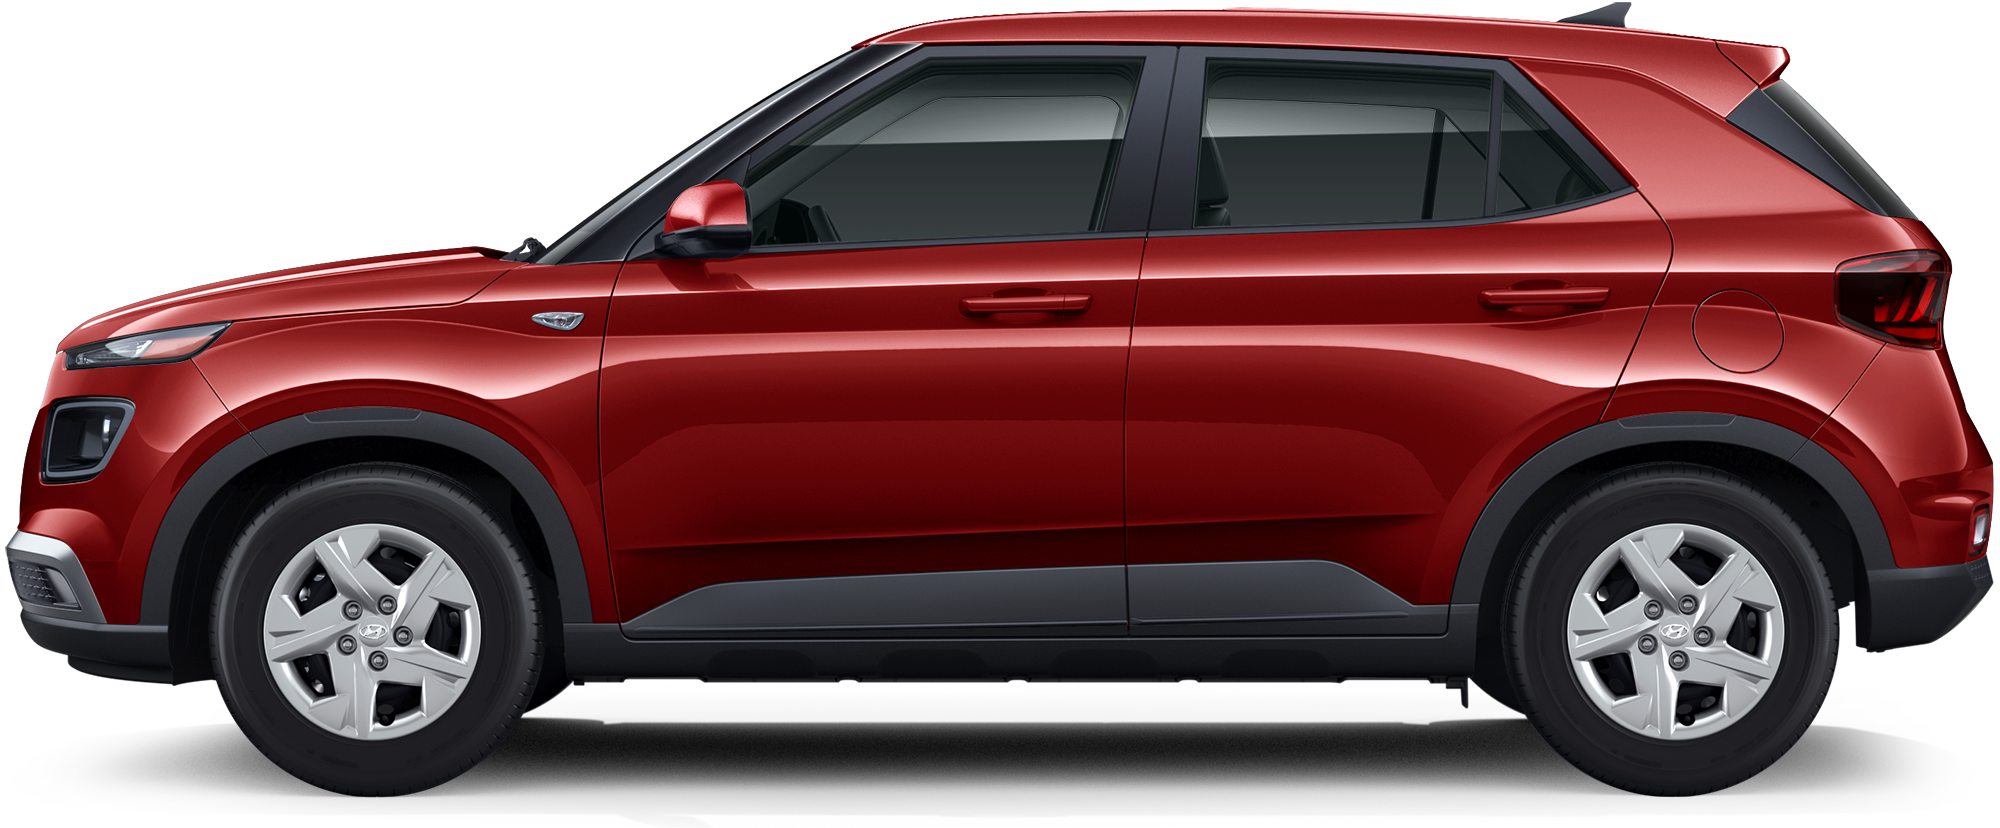 2020 Hyundai Venue SUV SE